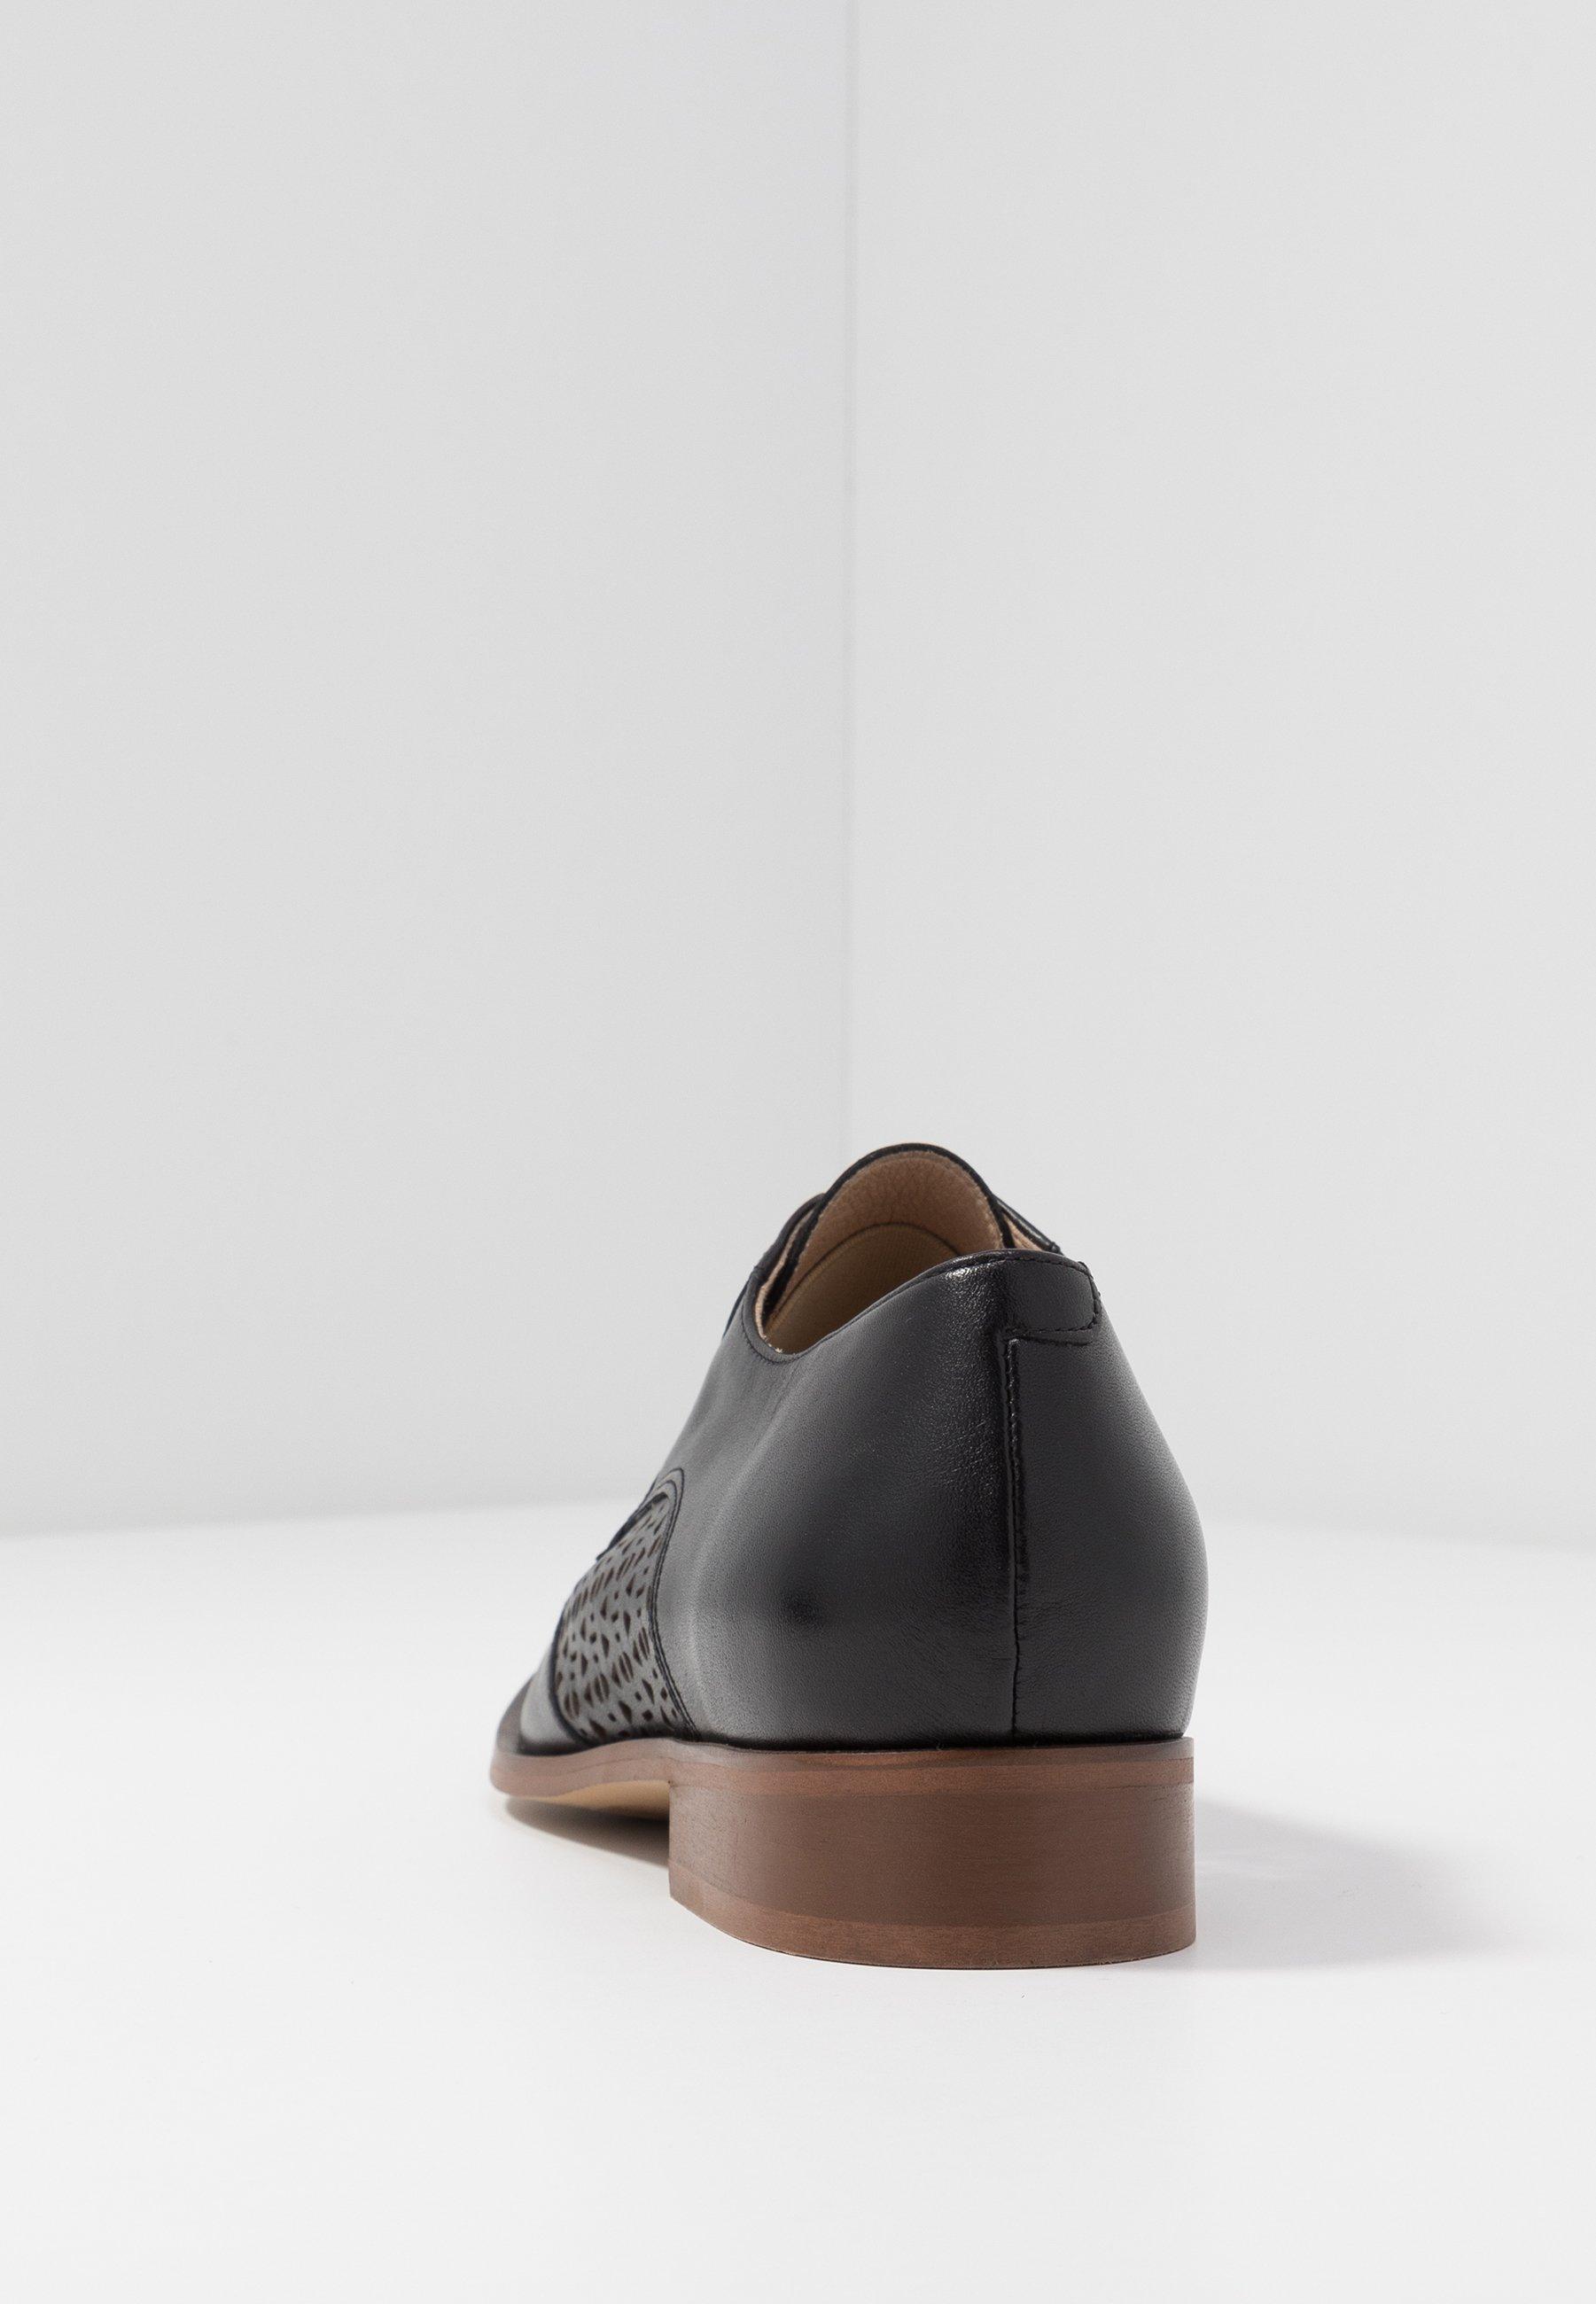 San Marina Maciva - Slippers Black